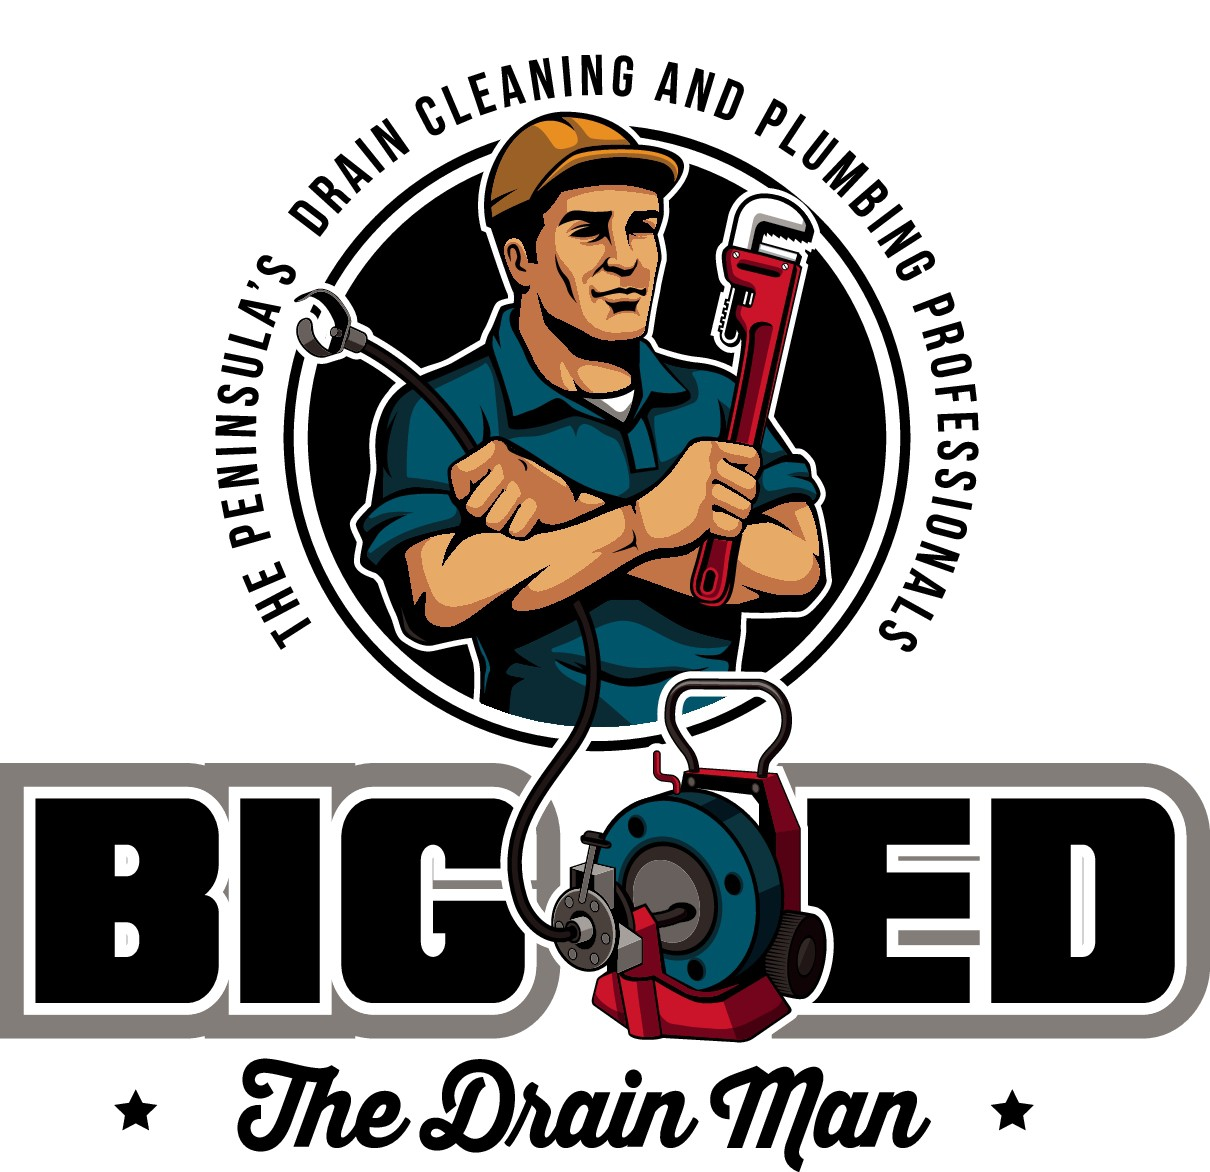 Big Ed The Drain Man